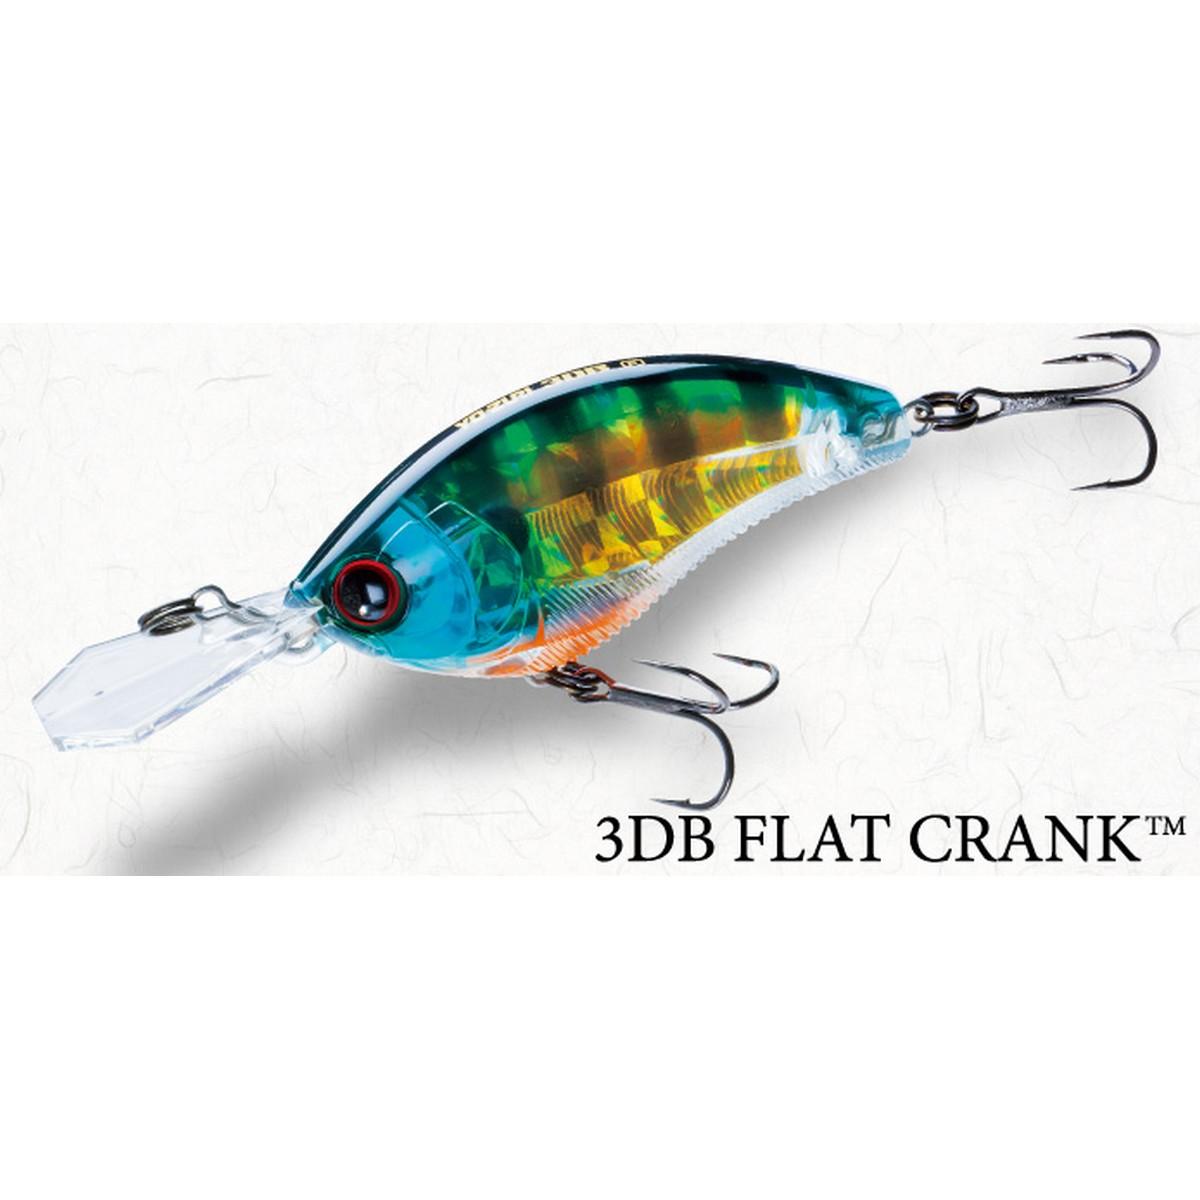 Воблер Yo-Zuri 3DB Flat Crank